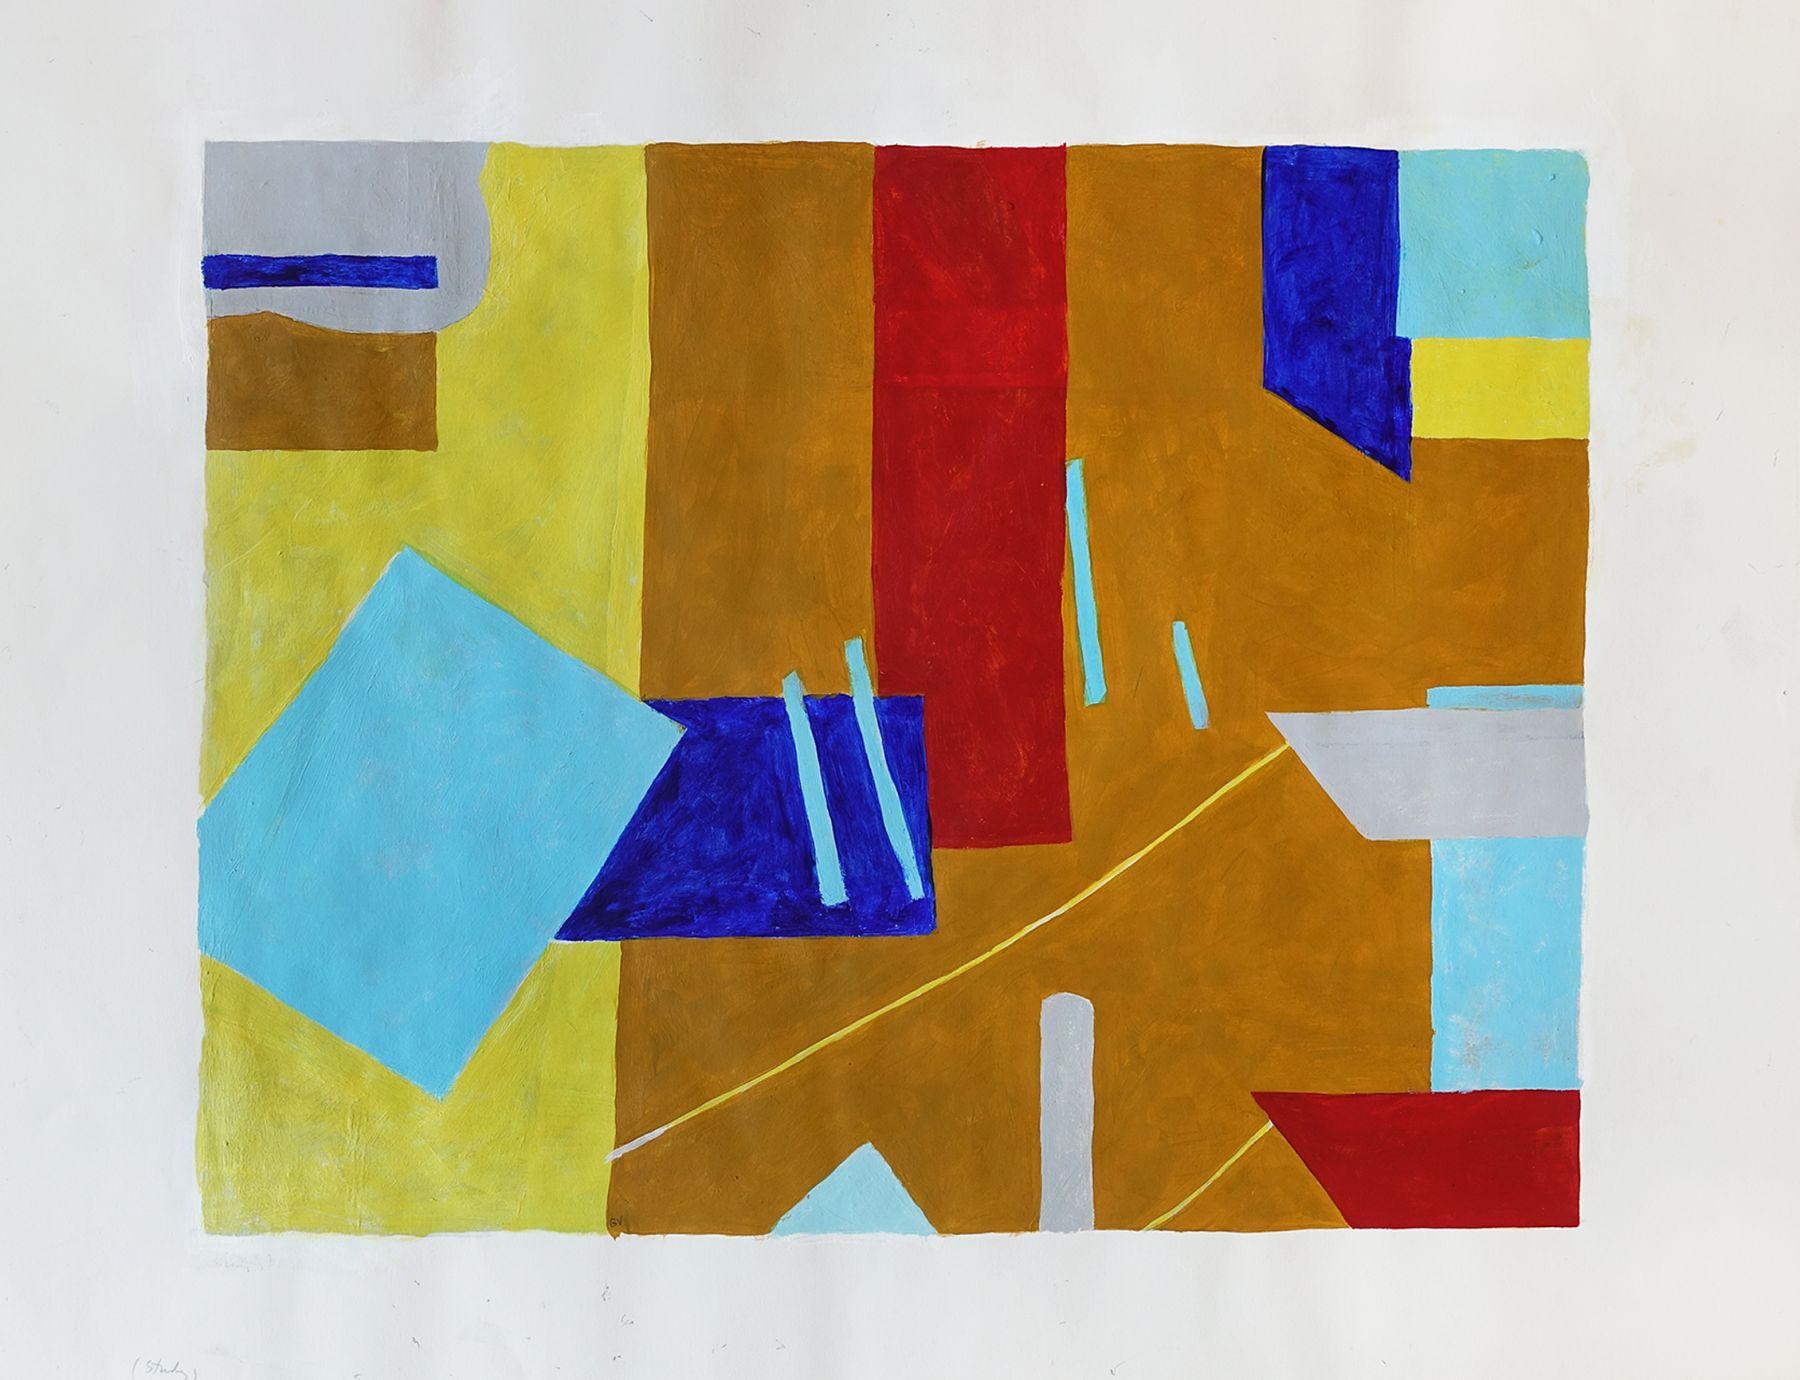 George Vranesh (1926-2014) Two Boats, circa 1972